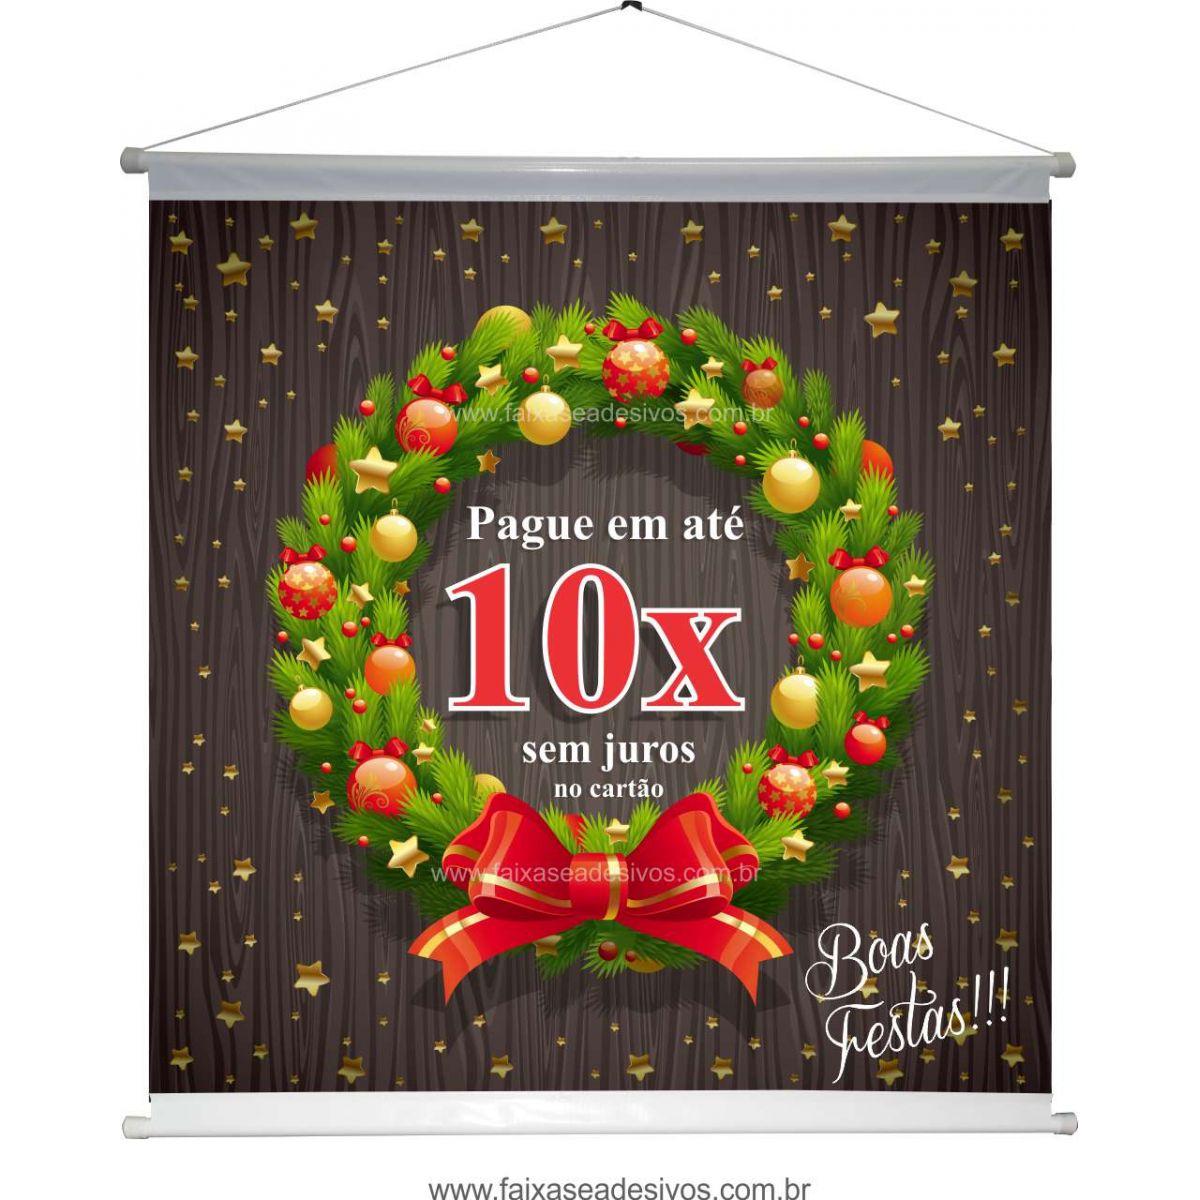 B630N - Banner para o Natal - 90x90cm - Pode trocar o texto ou colocar Logo  - Fac Signs